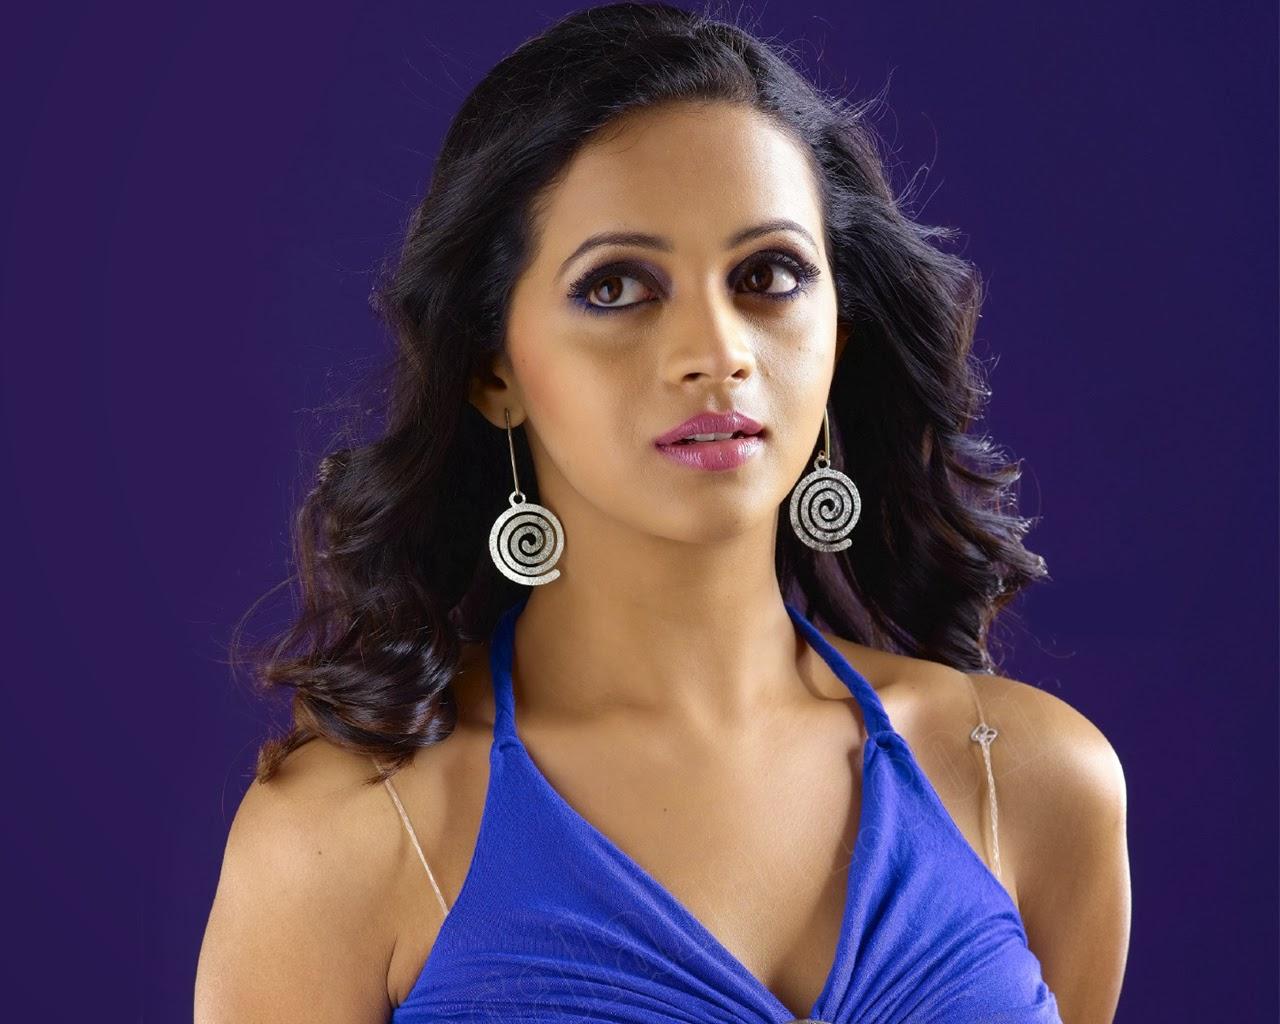 South Indian Actress Hot Boobs Sexy Stills